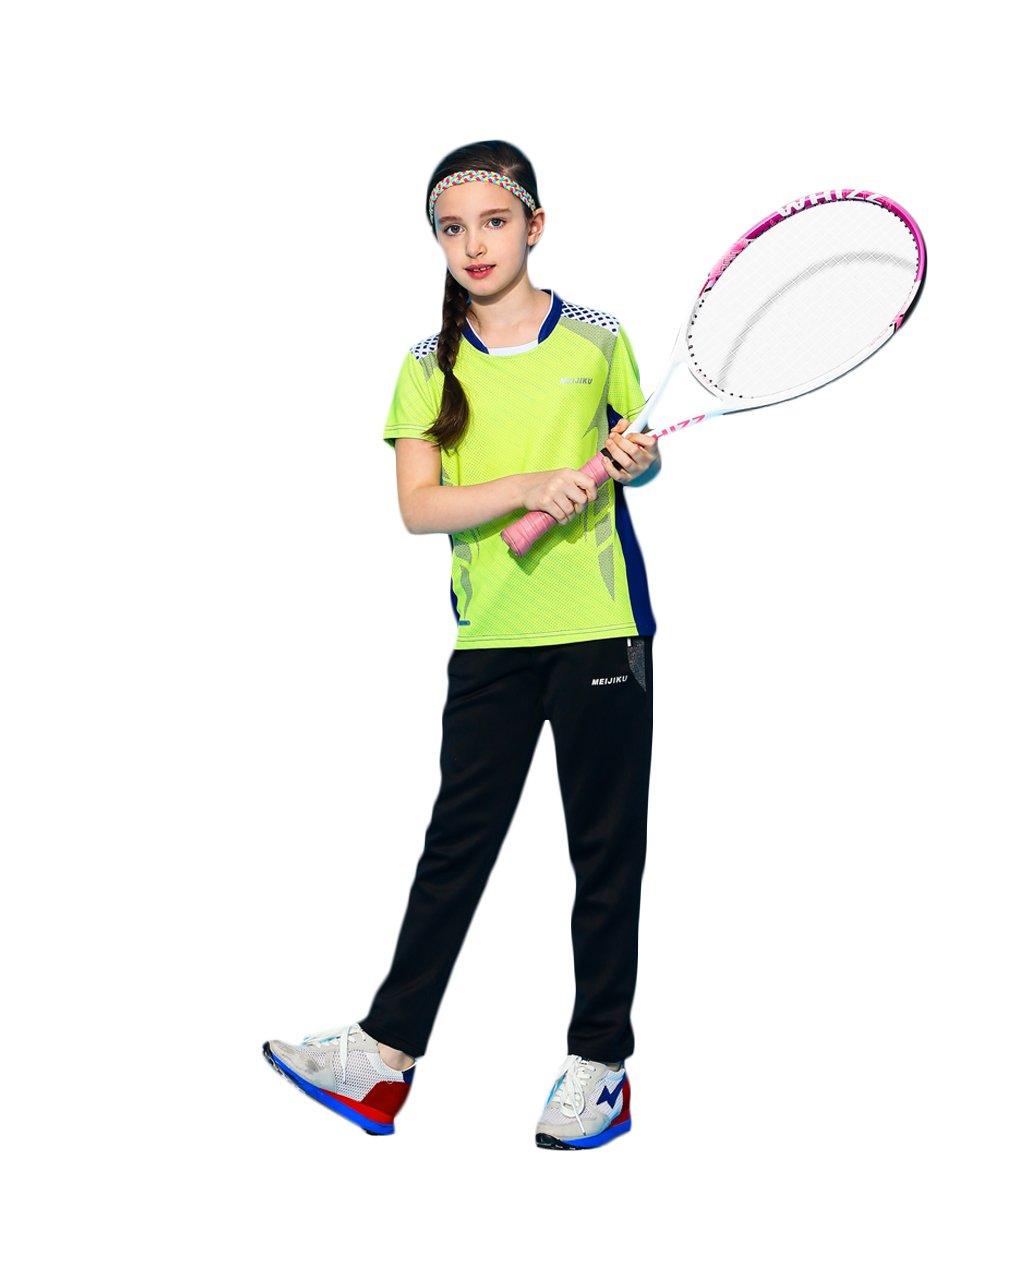 UDIY KidsユニセックスSports Clothingセット2018の新しいデザインファッションテニス、ゴルフ、バドミントン L/11-12 Years unisex pants set B07D28WH3G